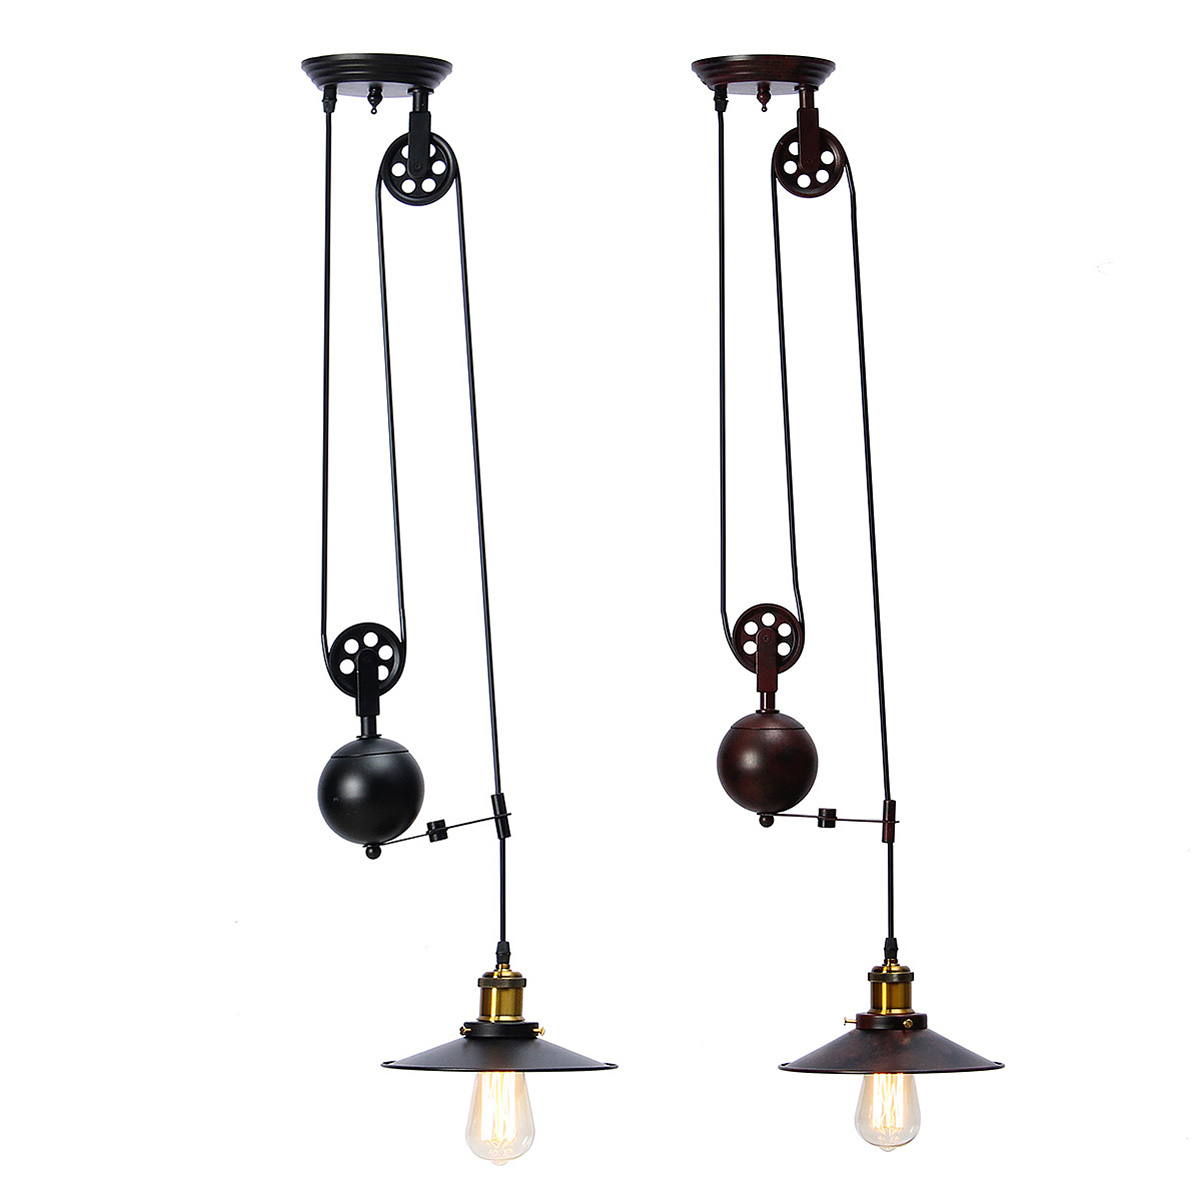 AC110-240V E27 Single Vintage Loft Retro Pendant Light Sconce Hanging Pulley Lamp Fixtures Restaurant Bar Home Decoration